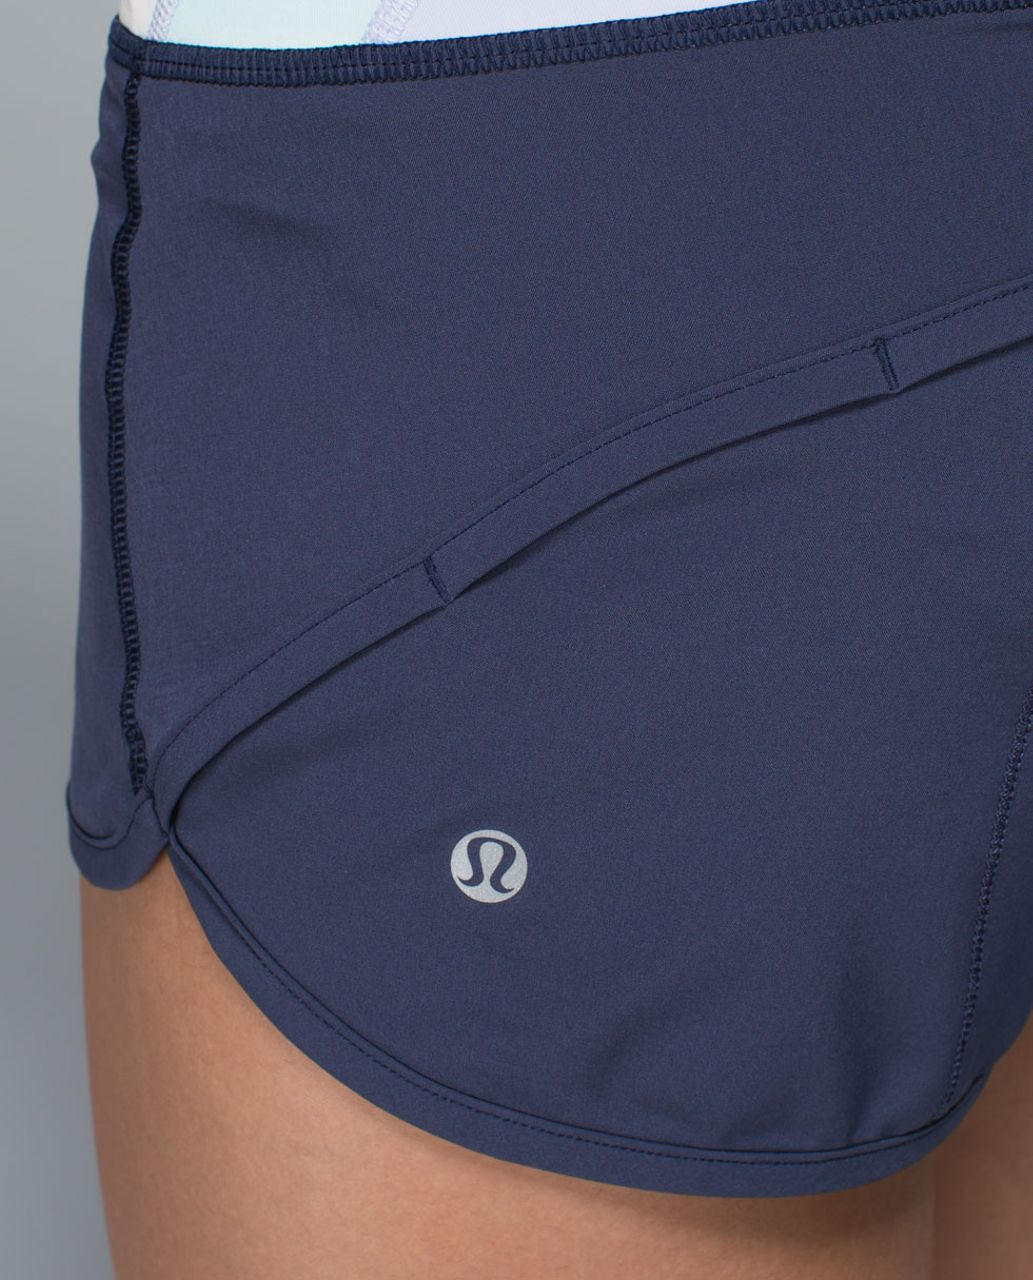 Lululemon Run:  Speed Short *4-way Stretch - Cadet Blue / Su14 Quilt 32